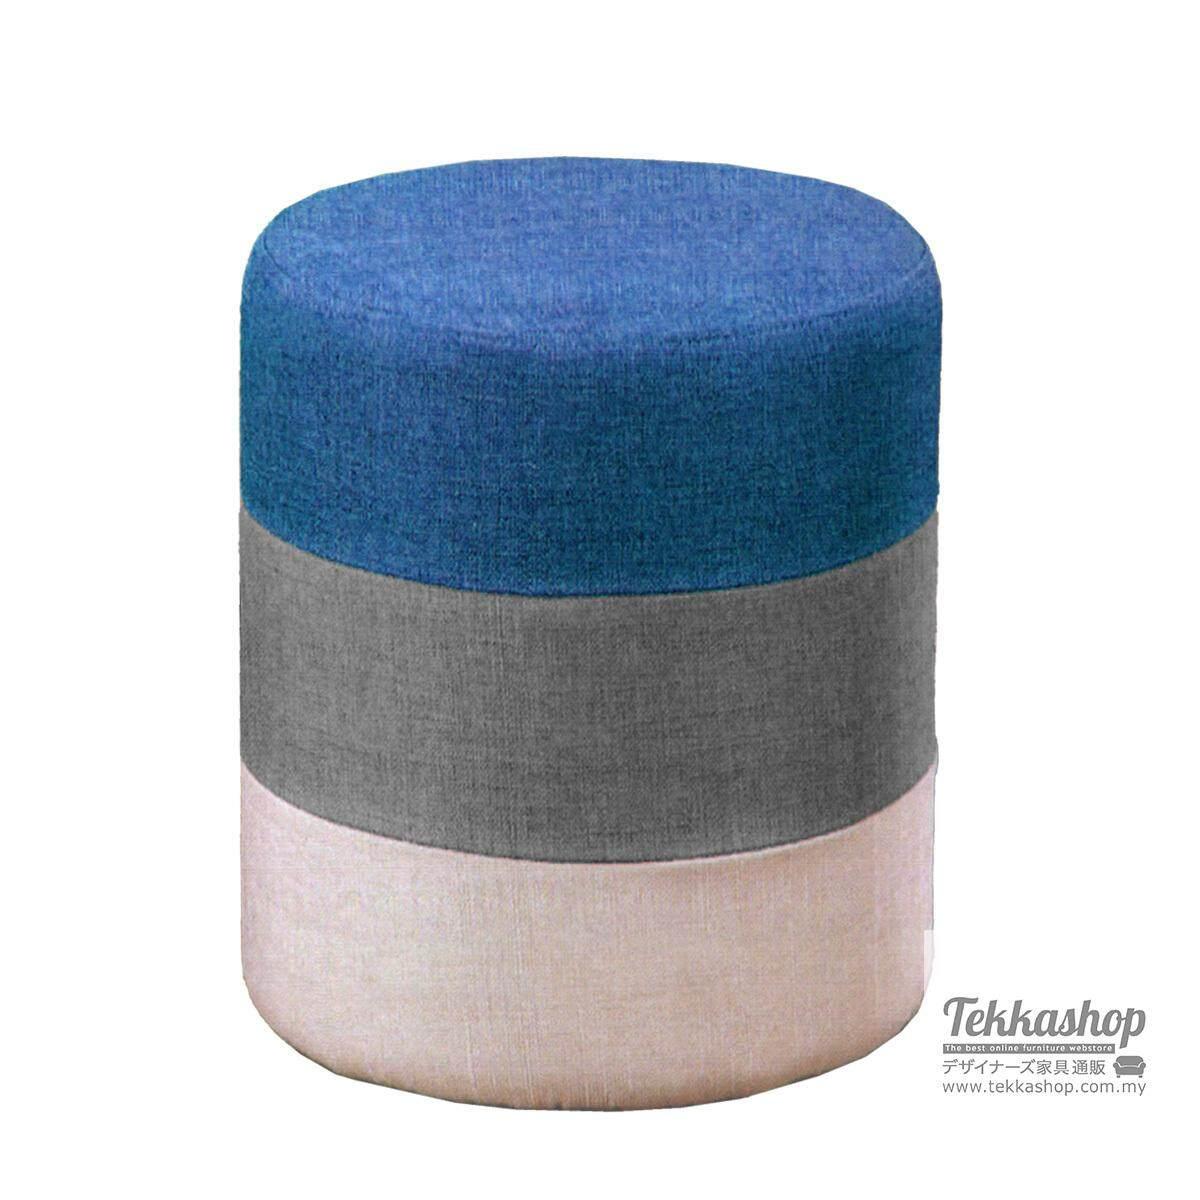 Tekkashop KKM882LC Fabric 3 Layers Round Cube Ottoman Foot Stool (Blue)